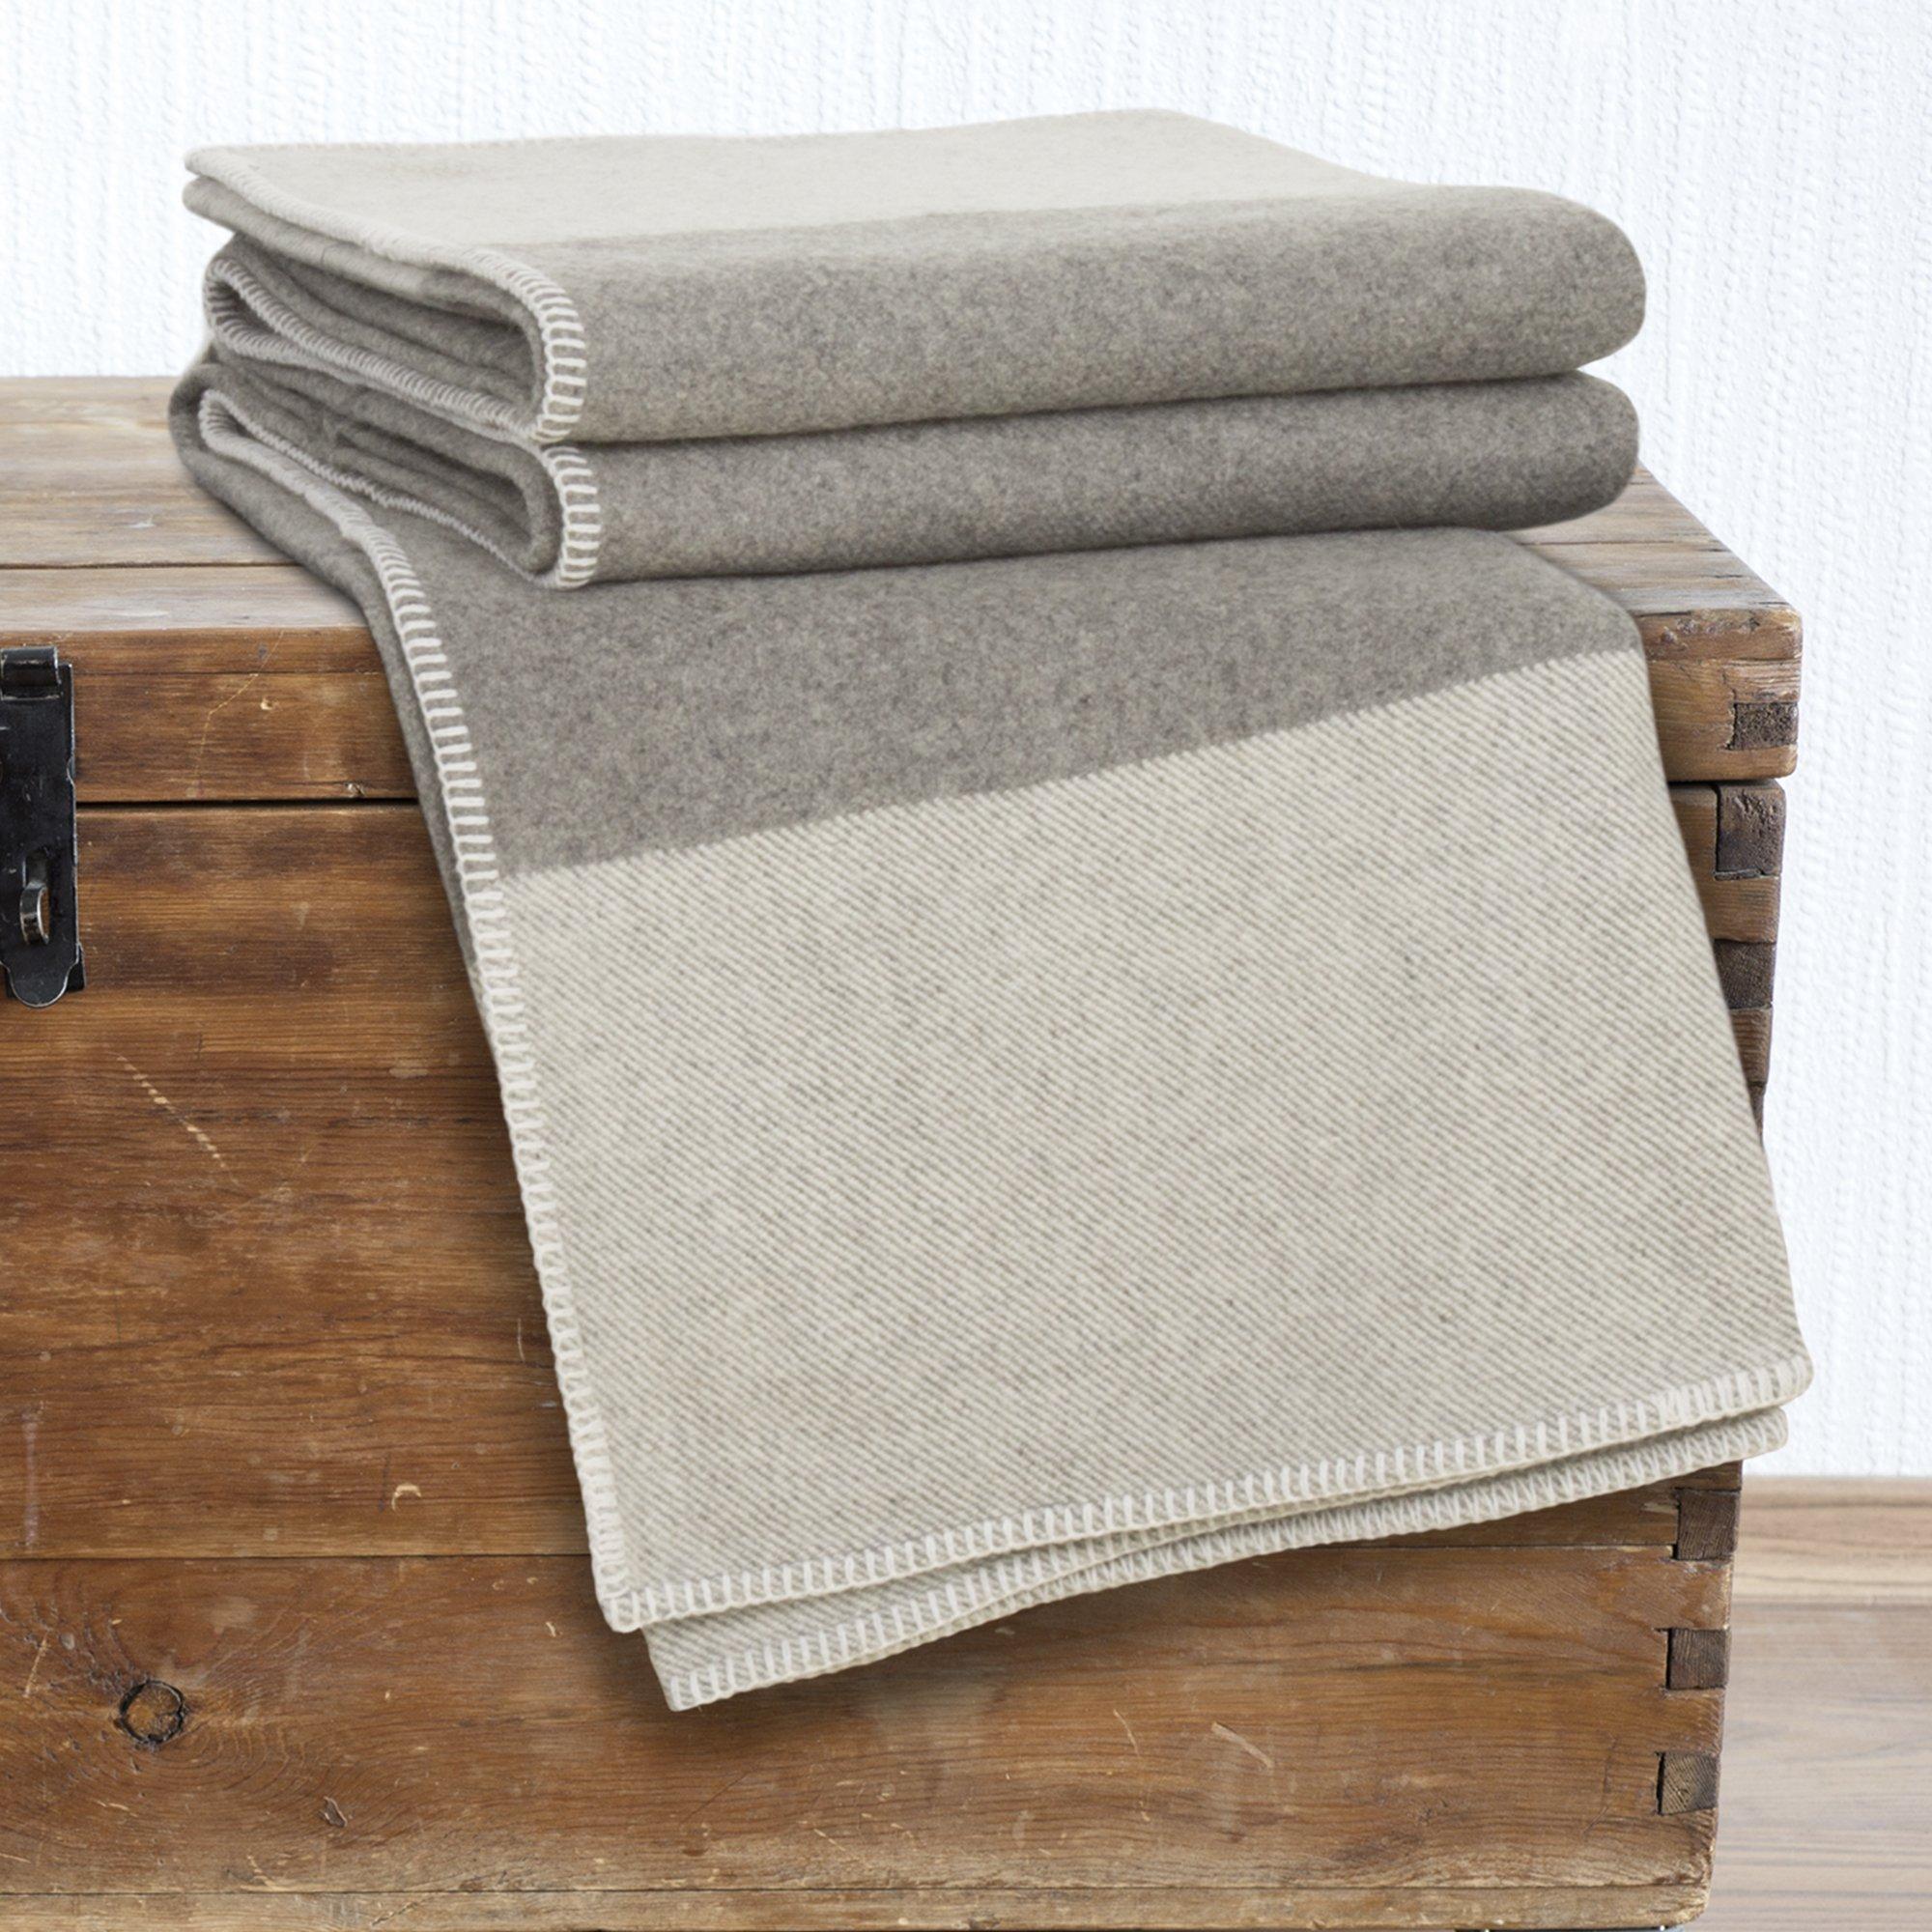 Lavish Home 100% Australian Wool Blanket, King, Platinum by Lavish Home